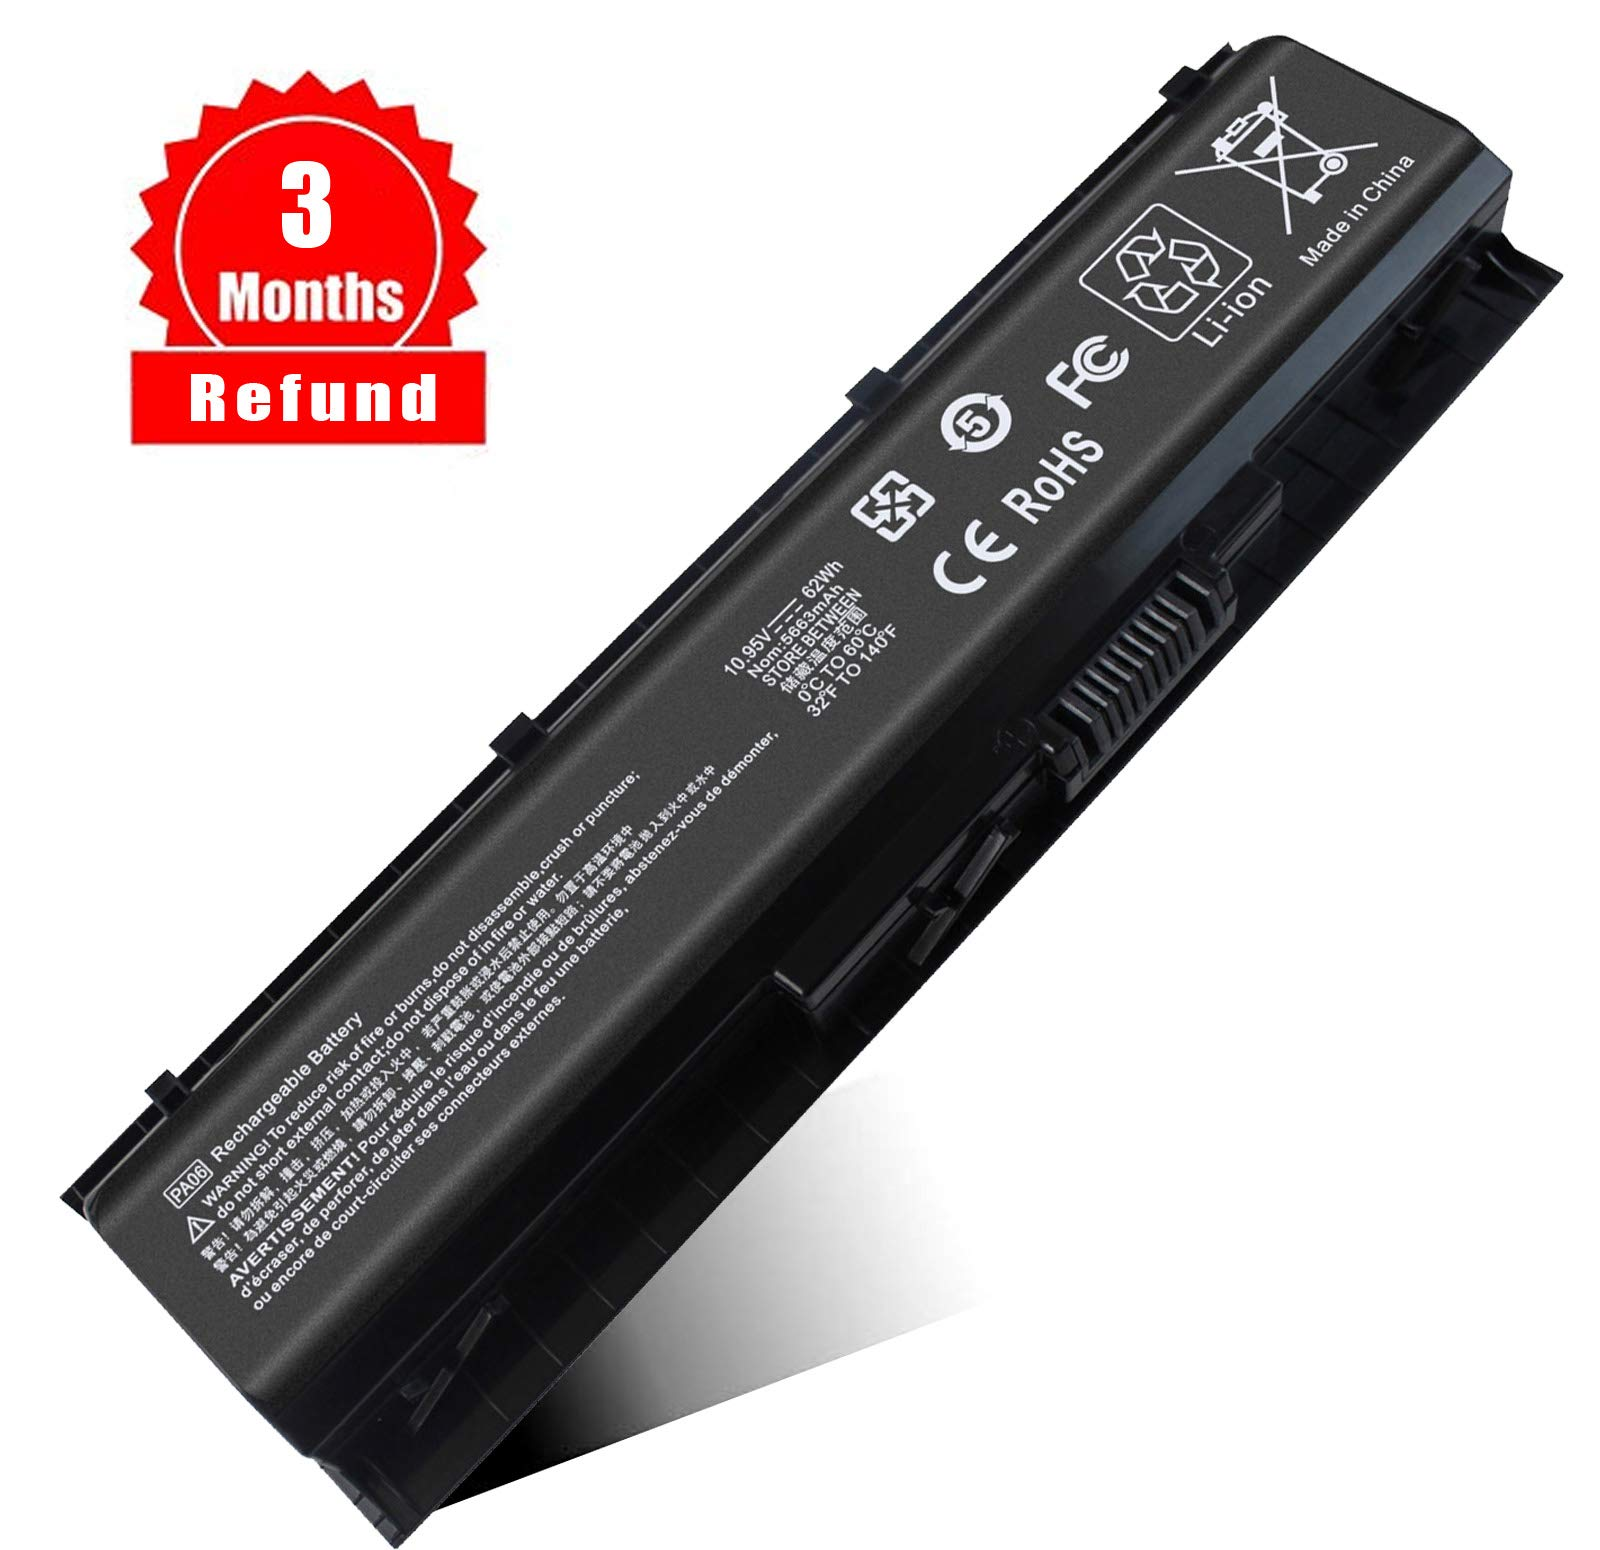 Bateria Pa06 Hp Omen 17 17-w 17-ab000 17-ab200 17t-ab00 Seri